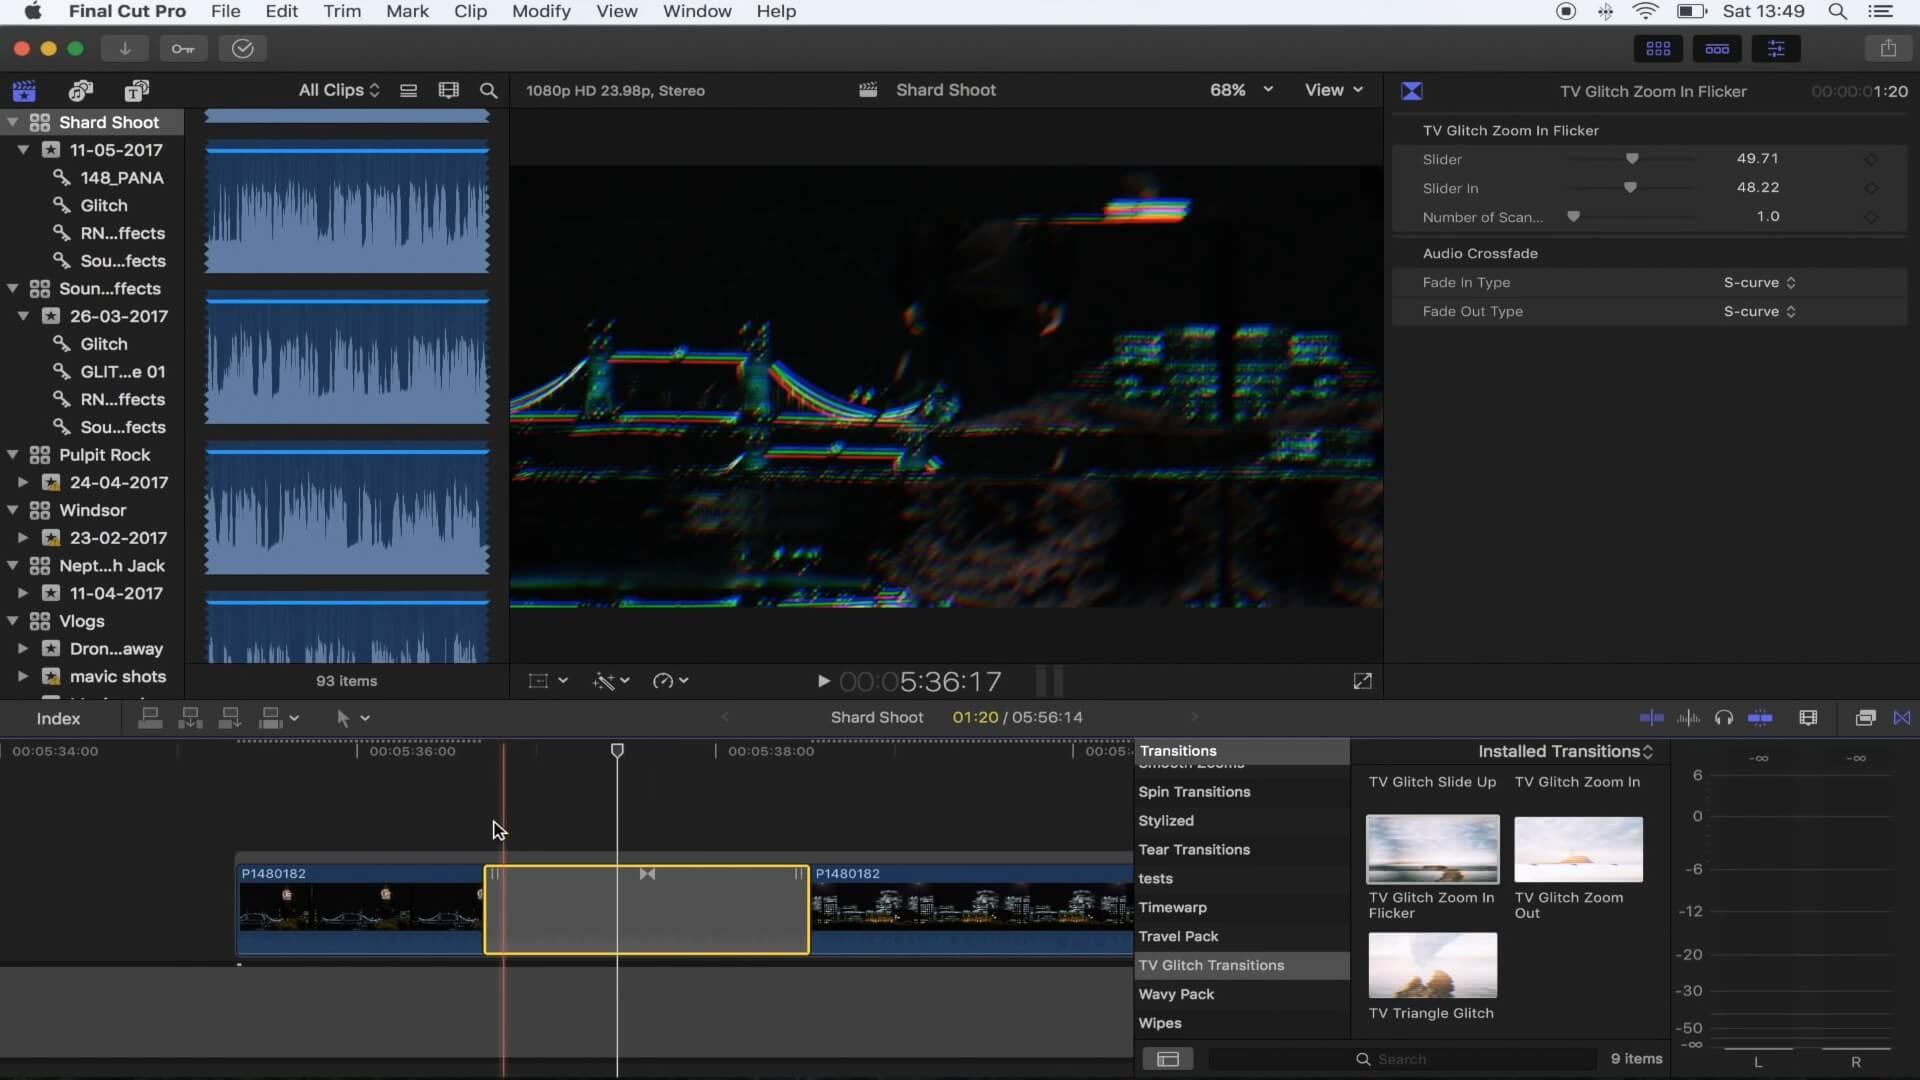 fcpx转场插件 电视信号干扰效果 vlog常用流行转场